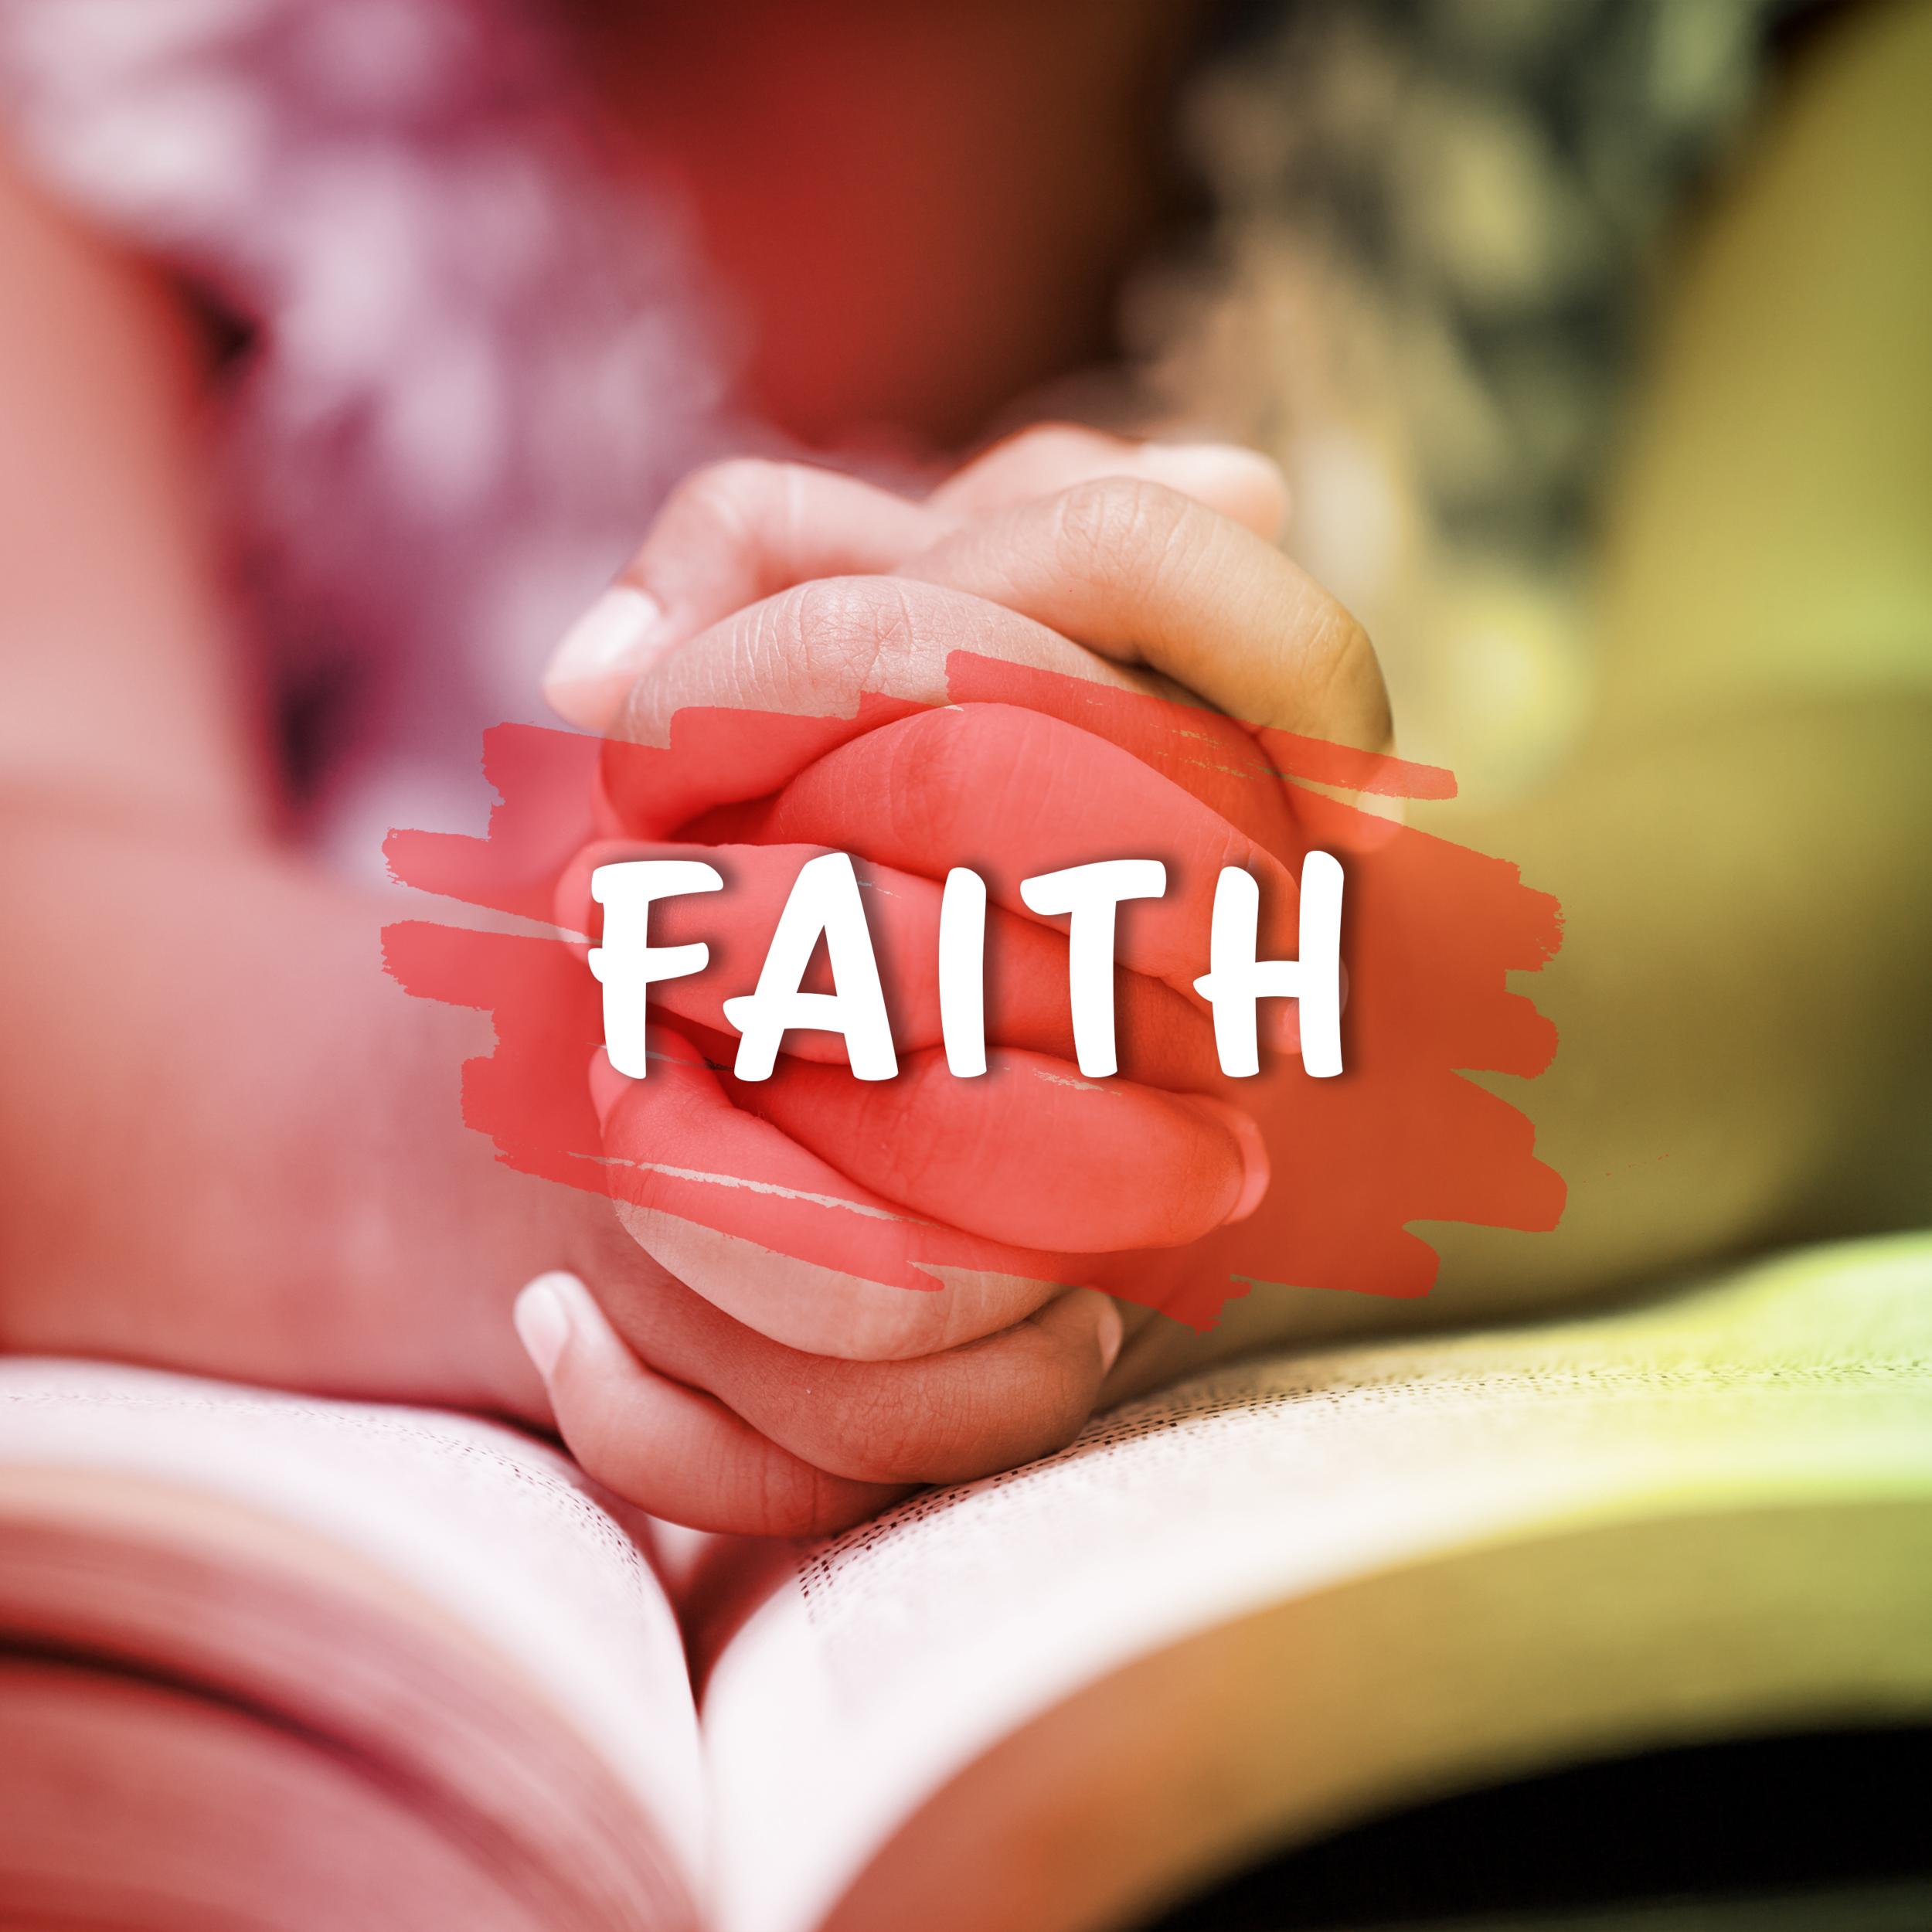 child faith.png